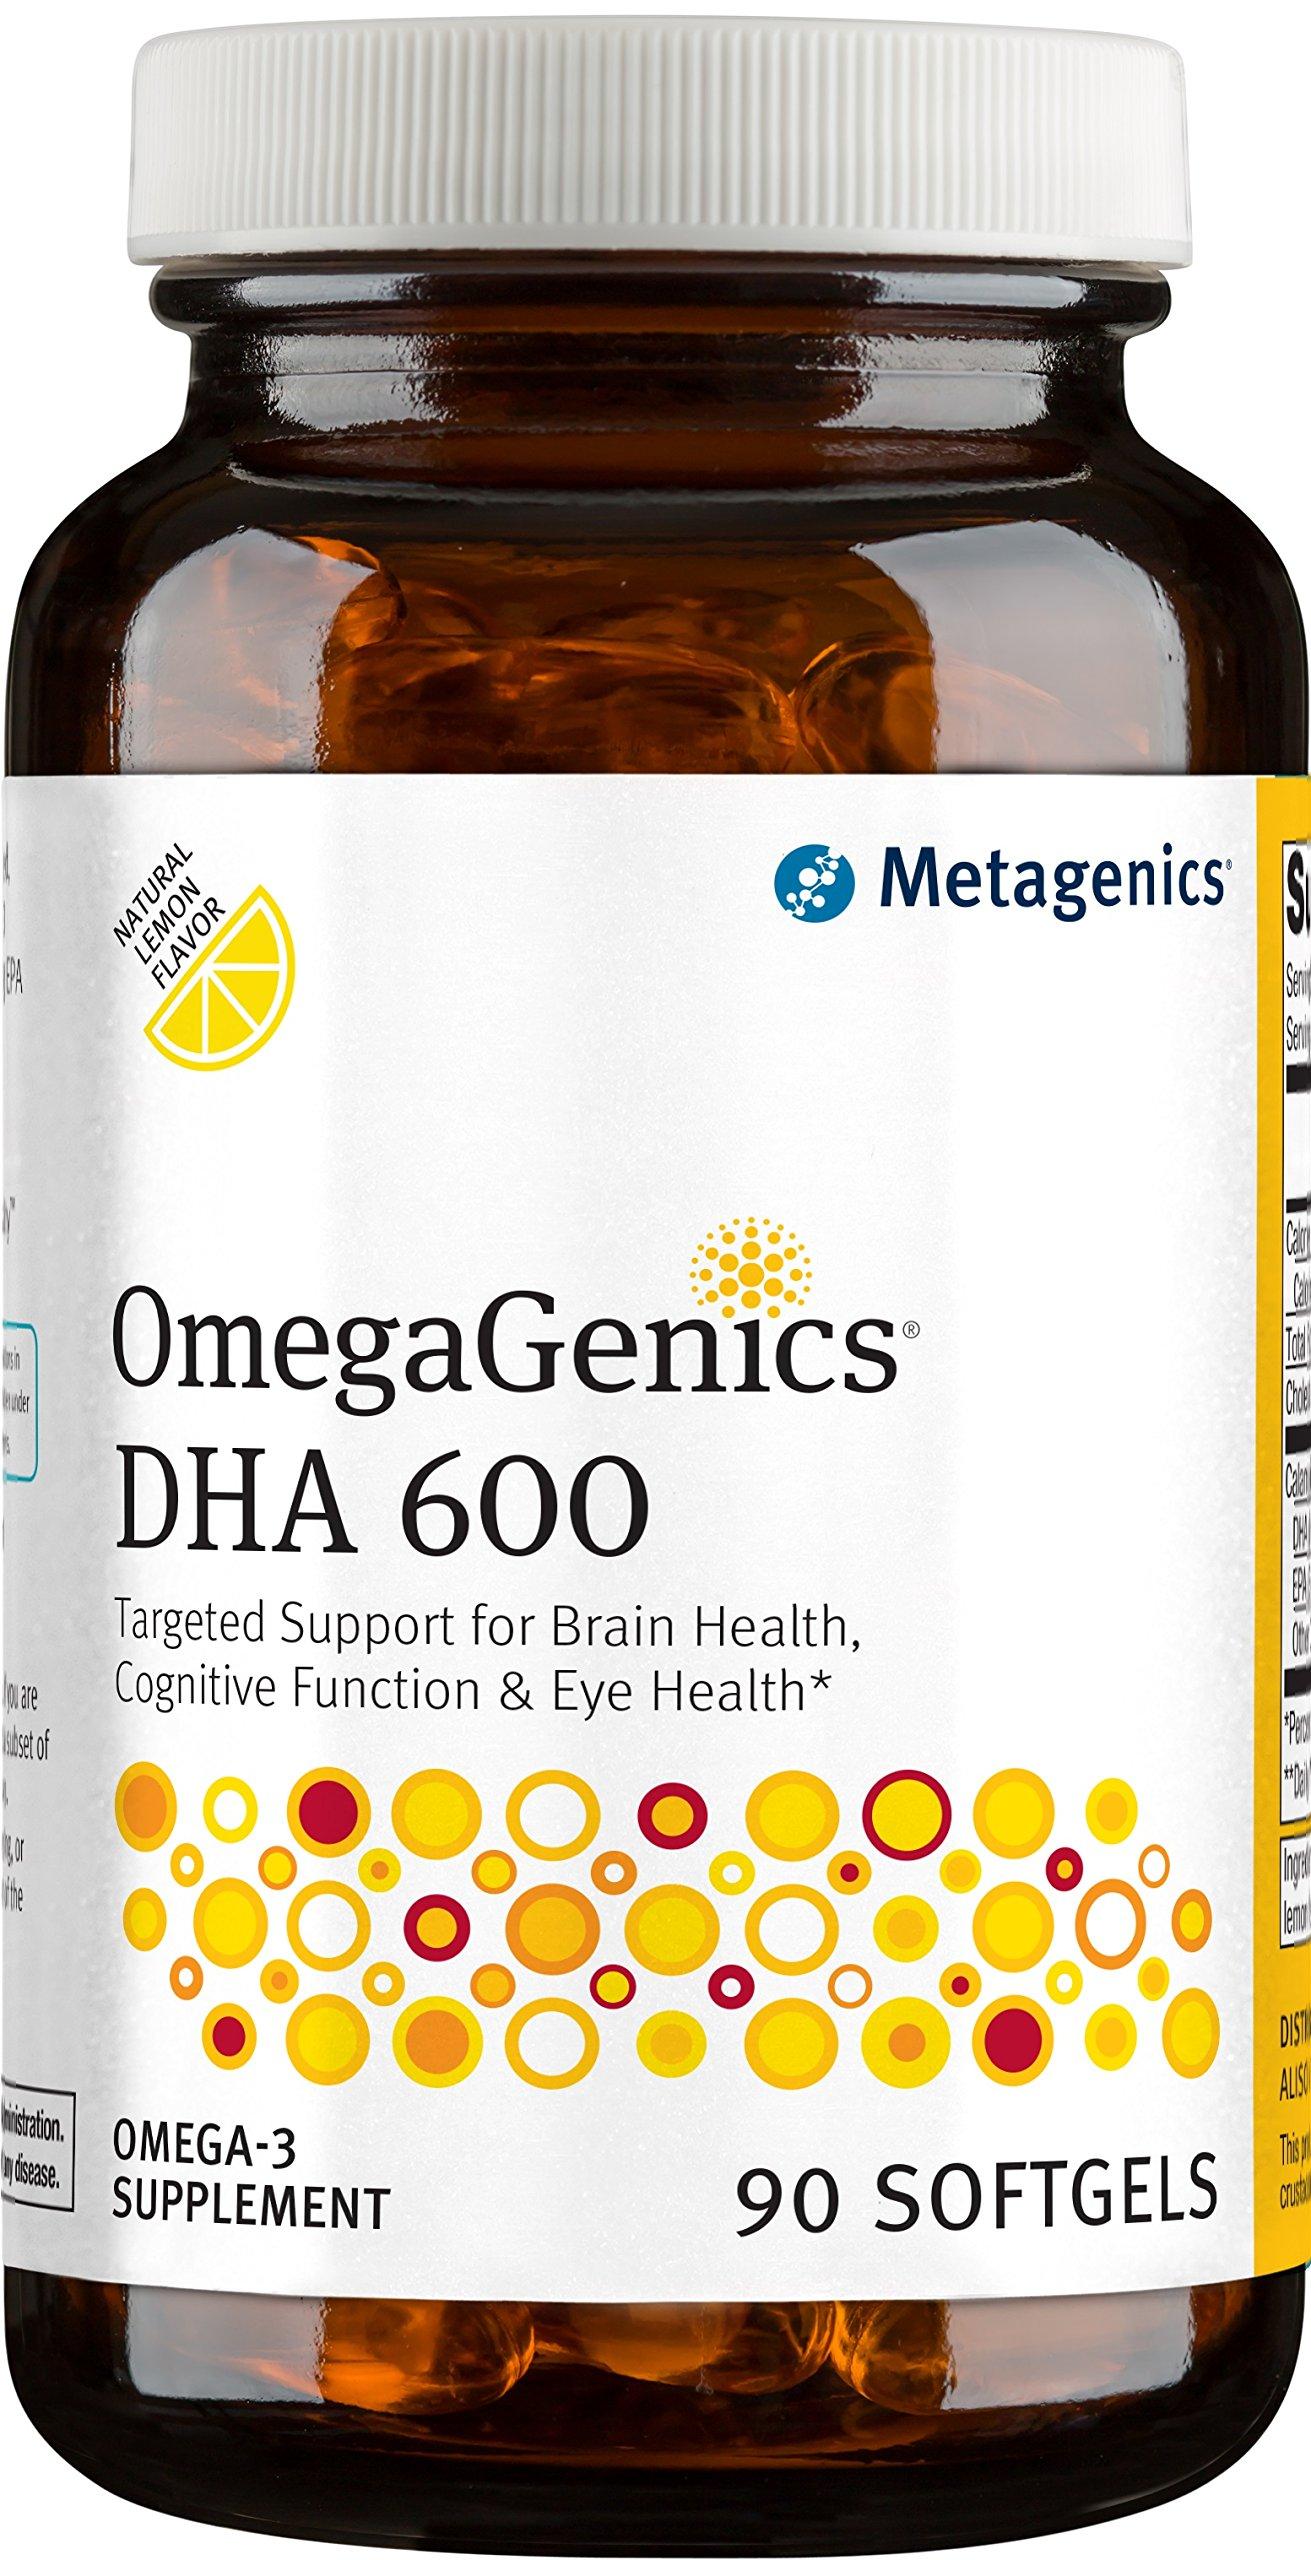 Metagenics - OmegaGenics DHA 600, 90 Count by Metagenics